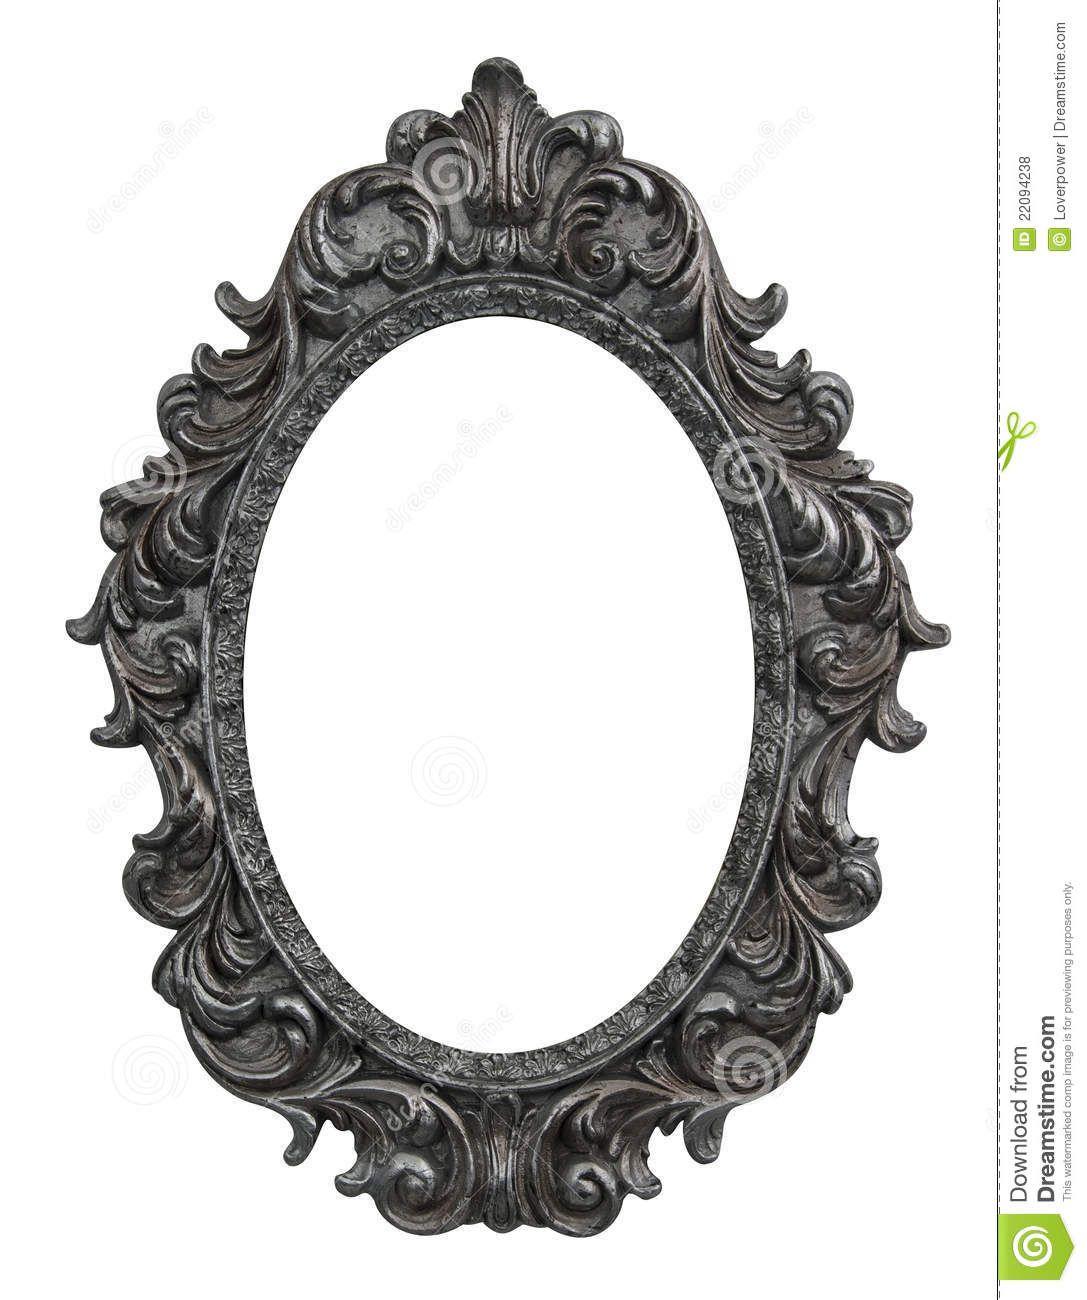 http://thumbs.dreamstime.com/z/baroque-oval-frame-22094238.jpg ...